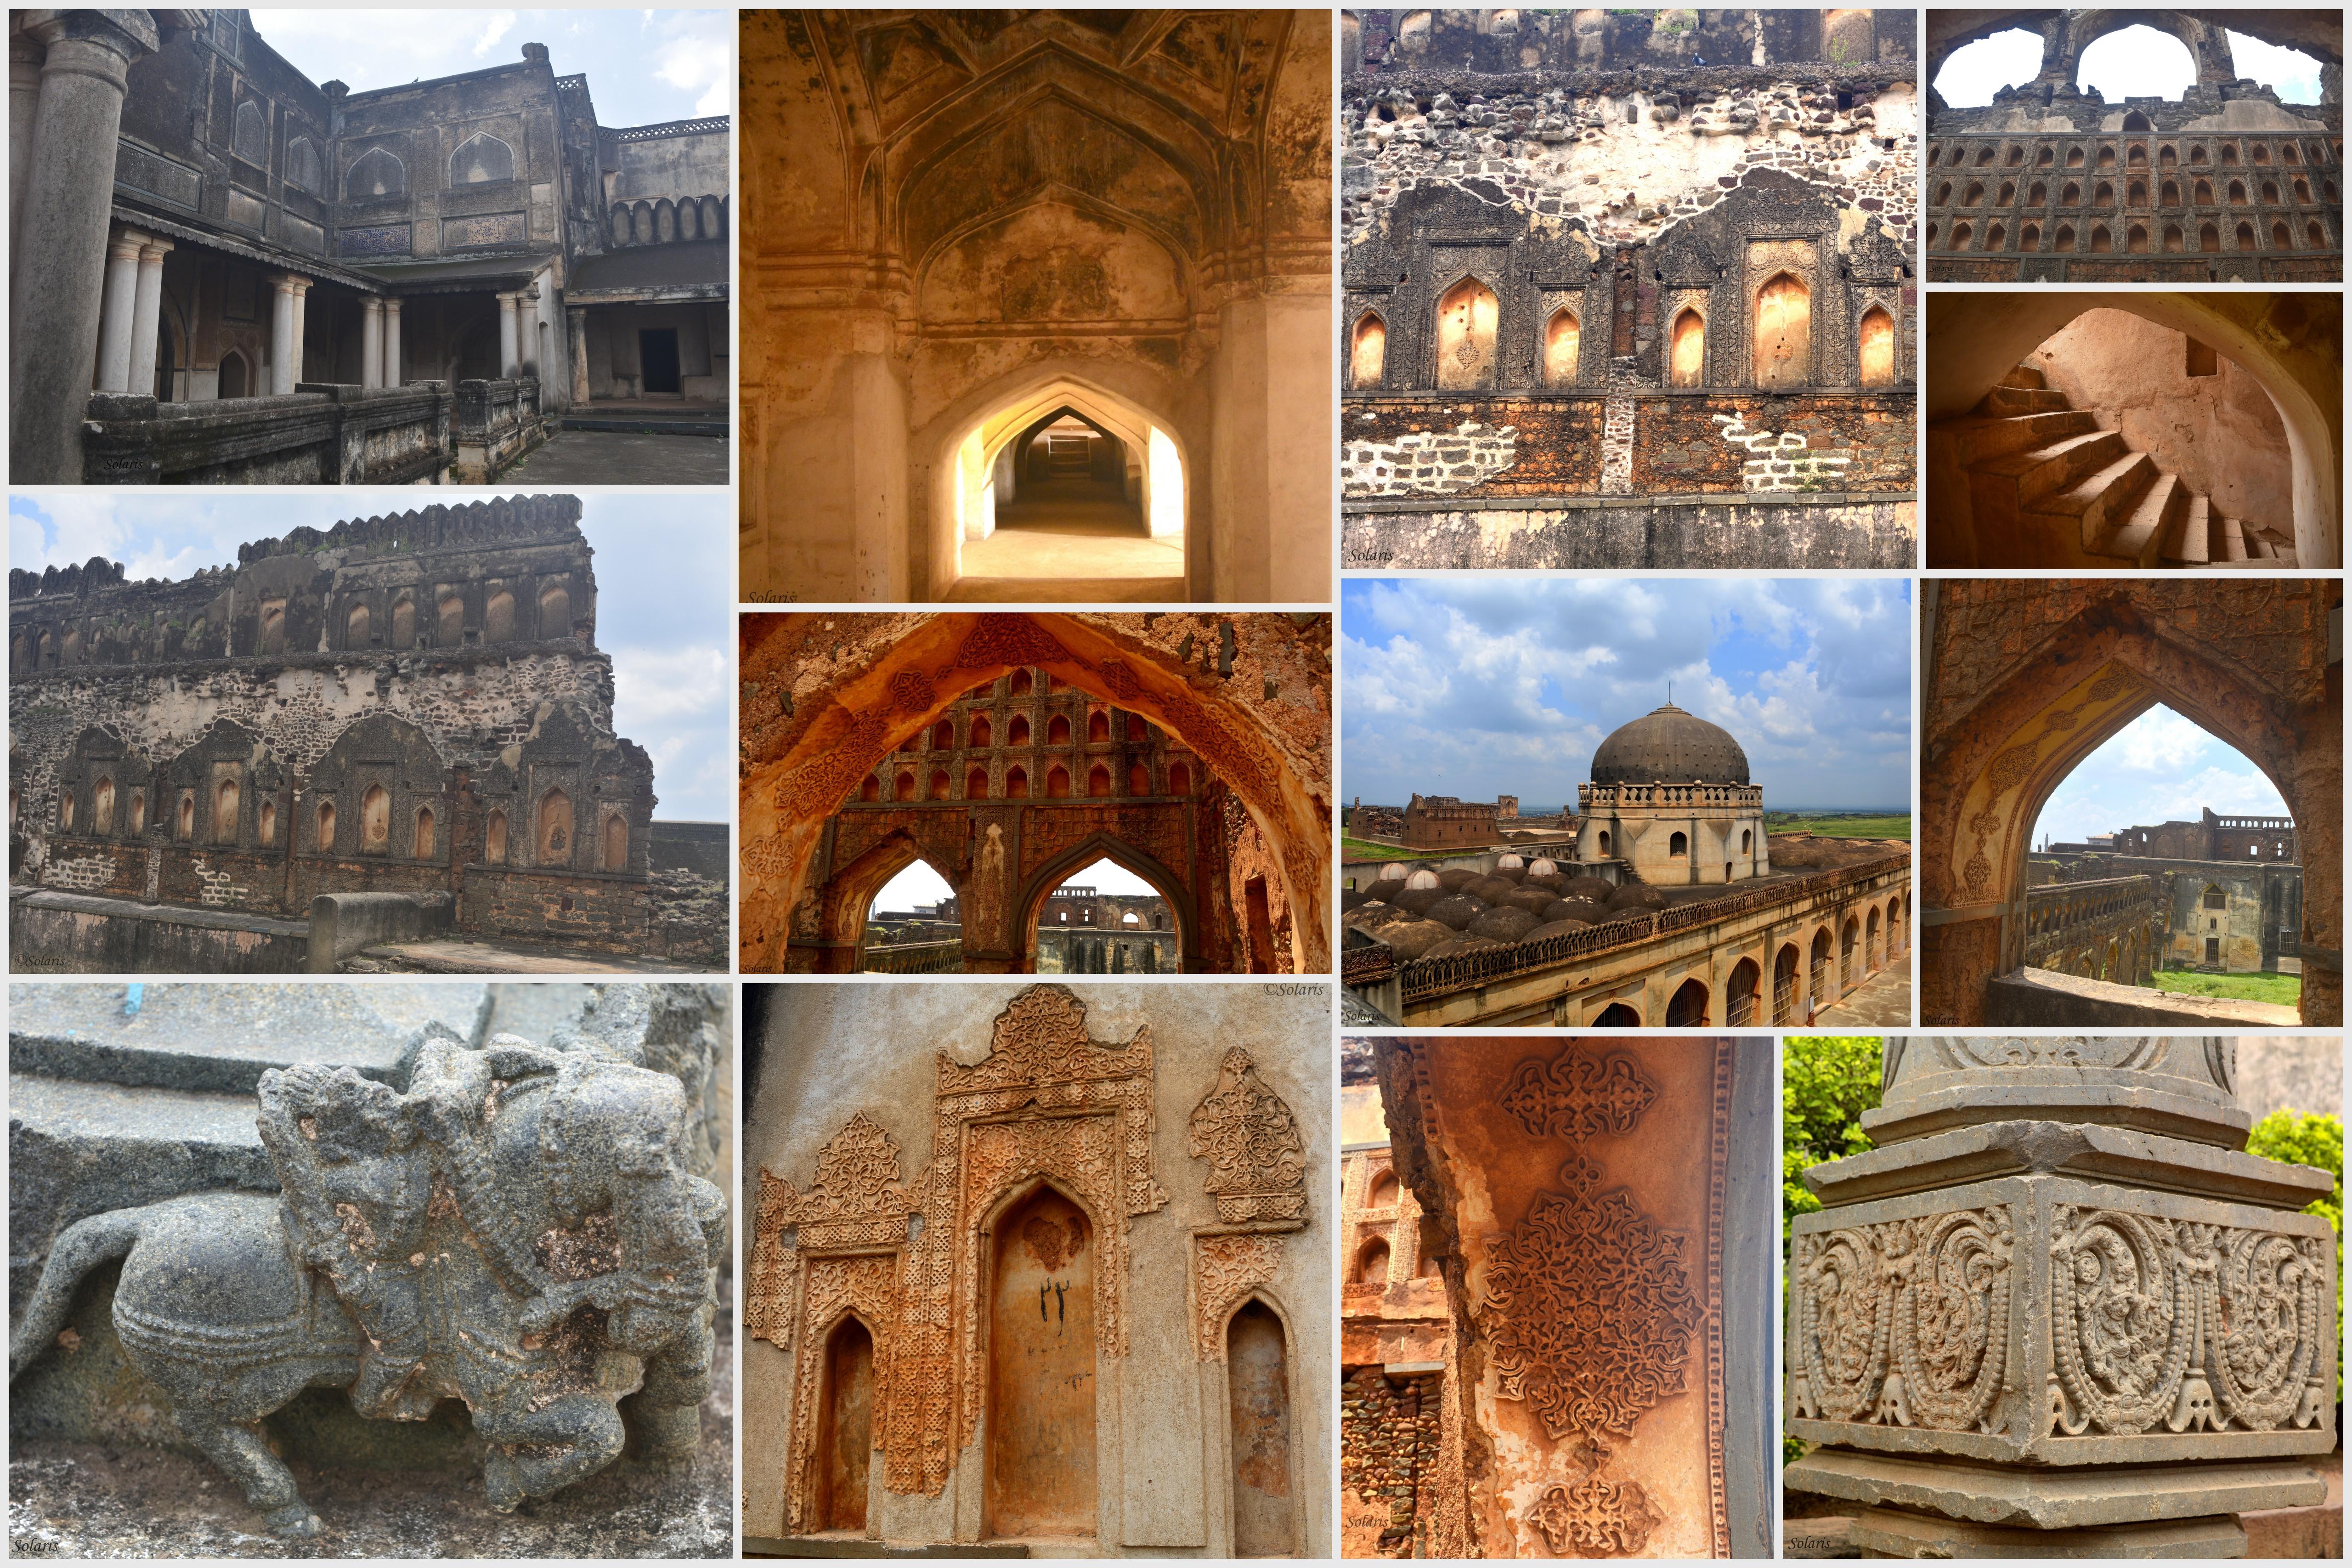 Tarkash Mahal, Bidar